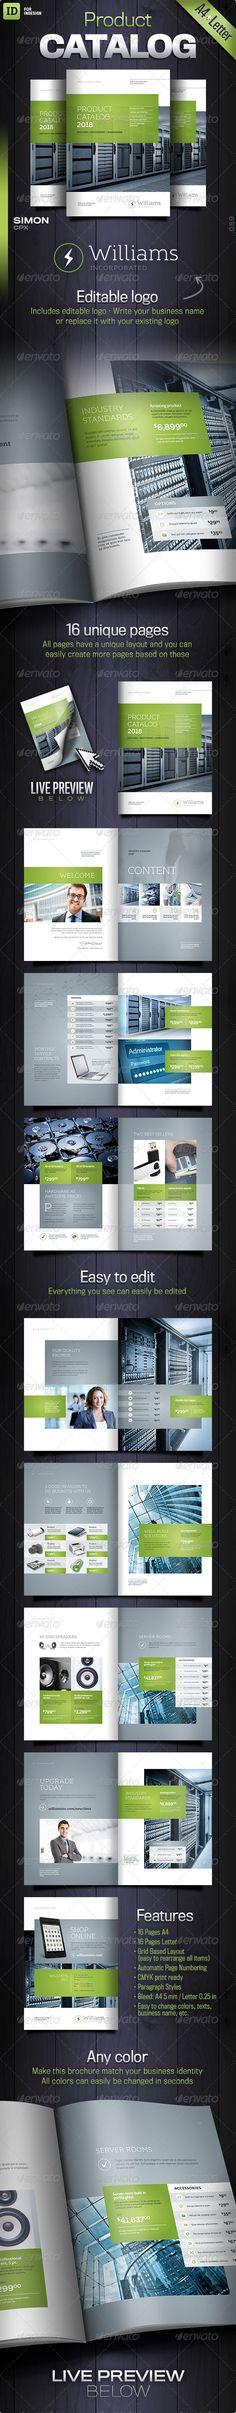 Product Catalog - Williams - Catalogs Brochures